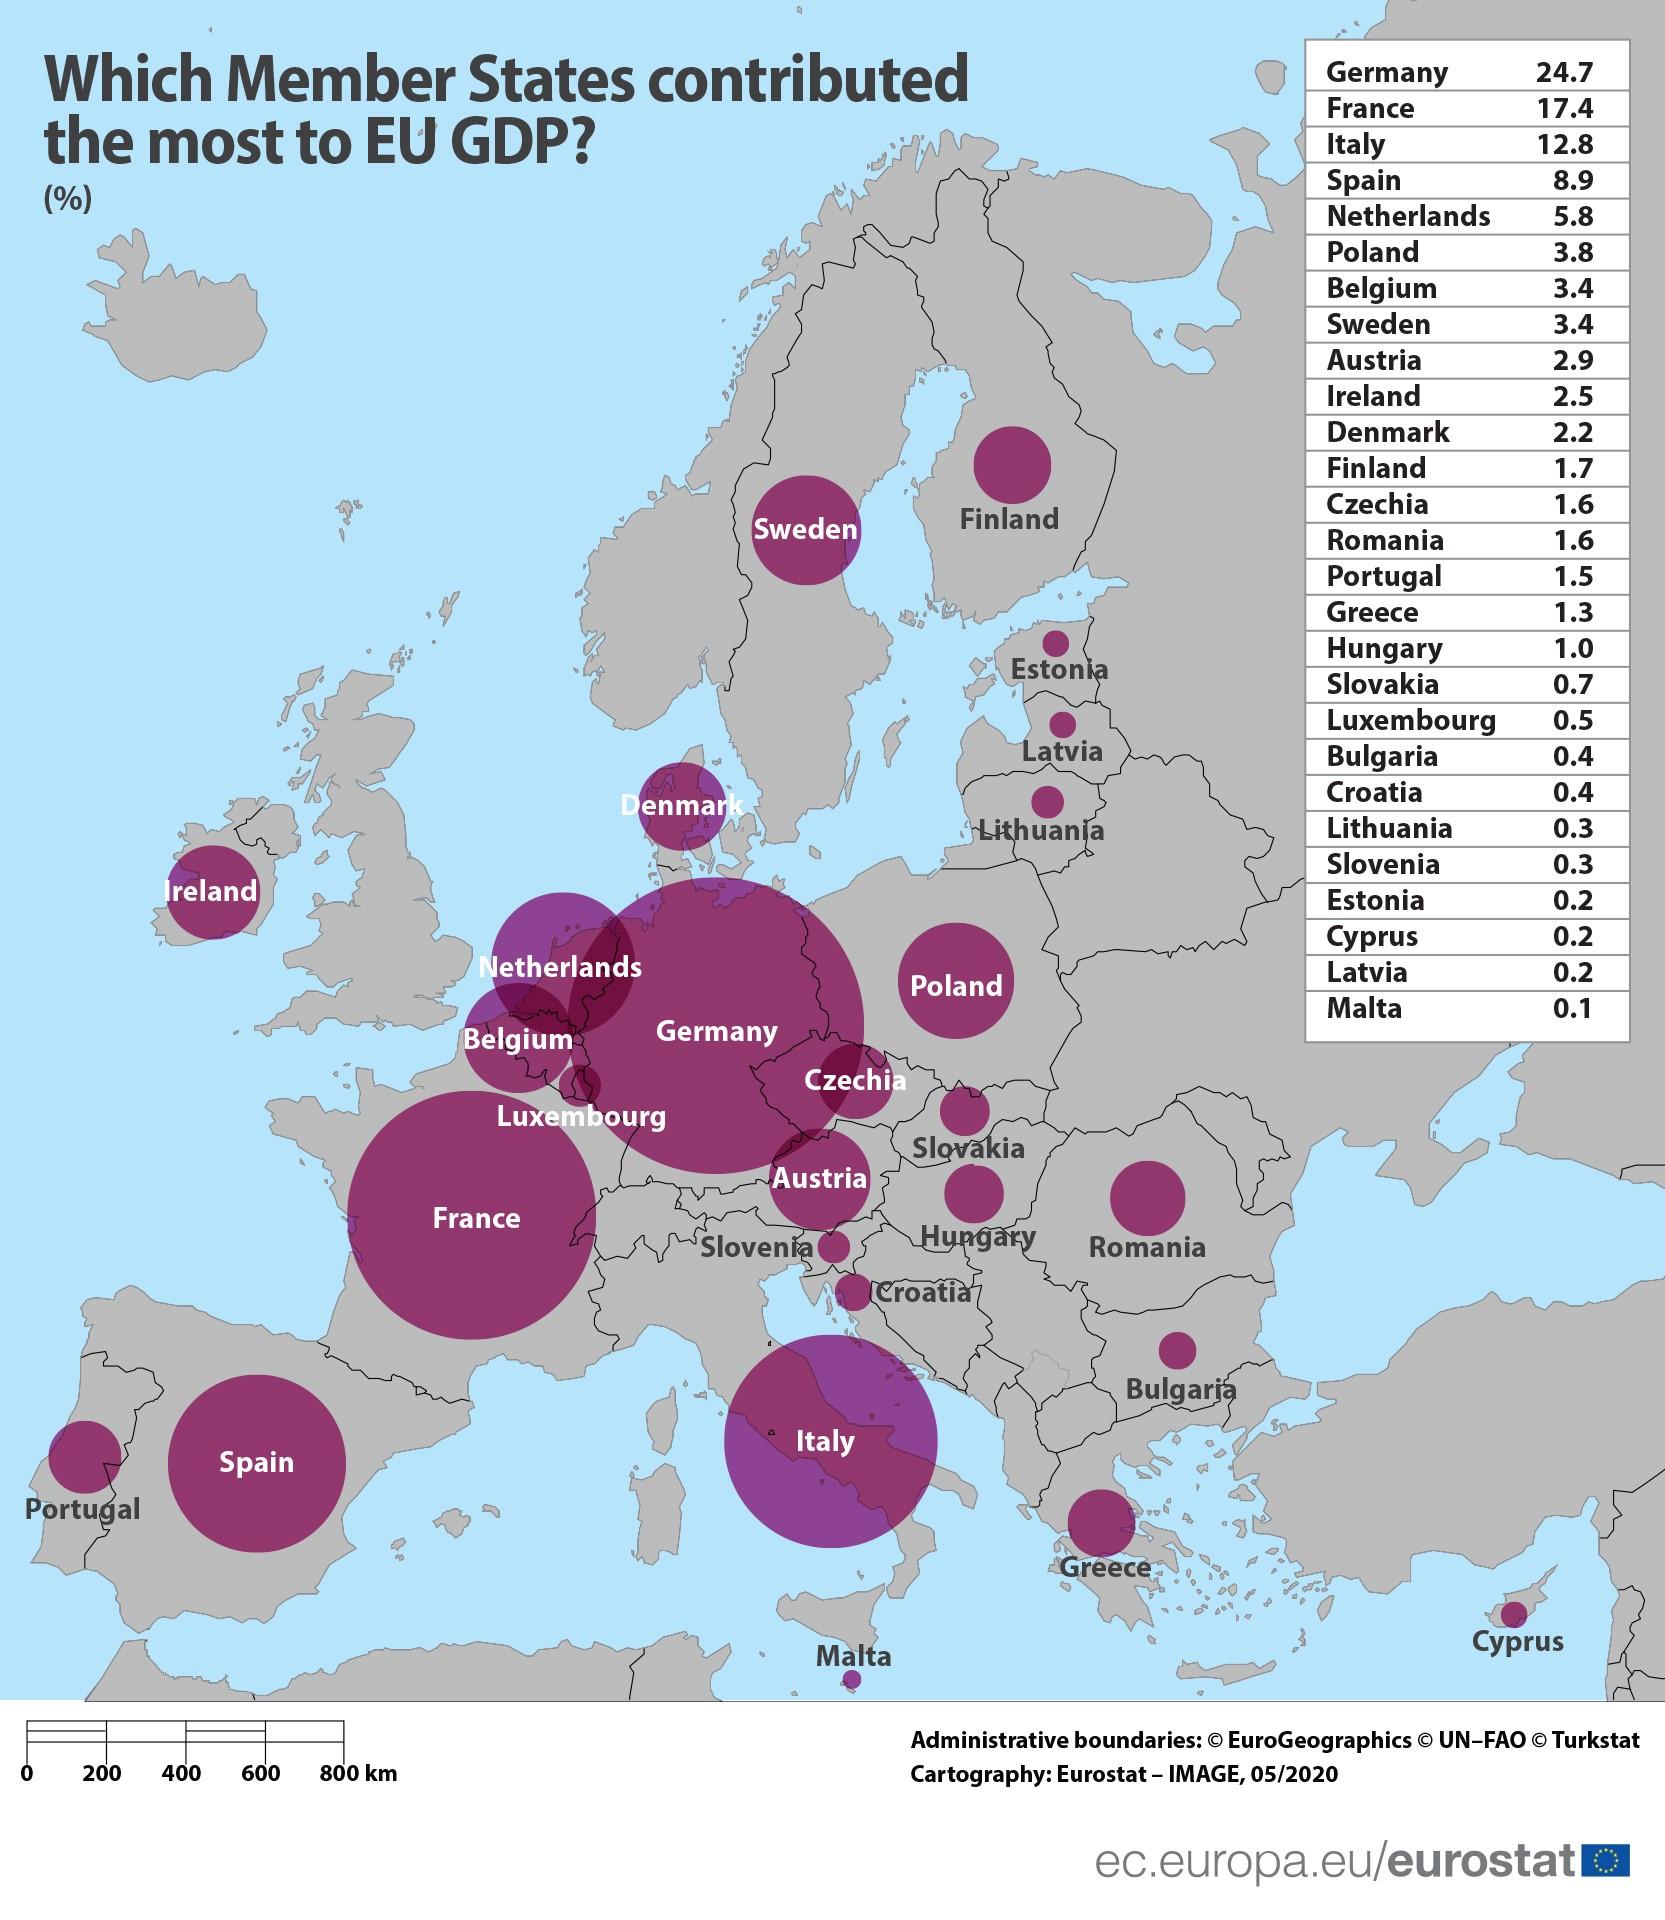 Share_in_EU_GDP_2019